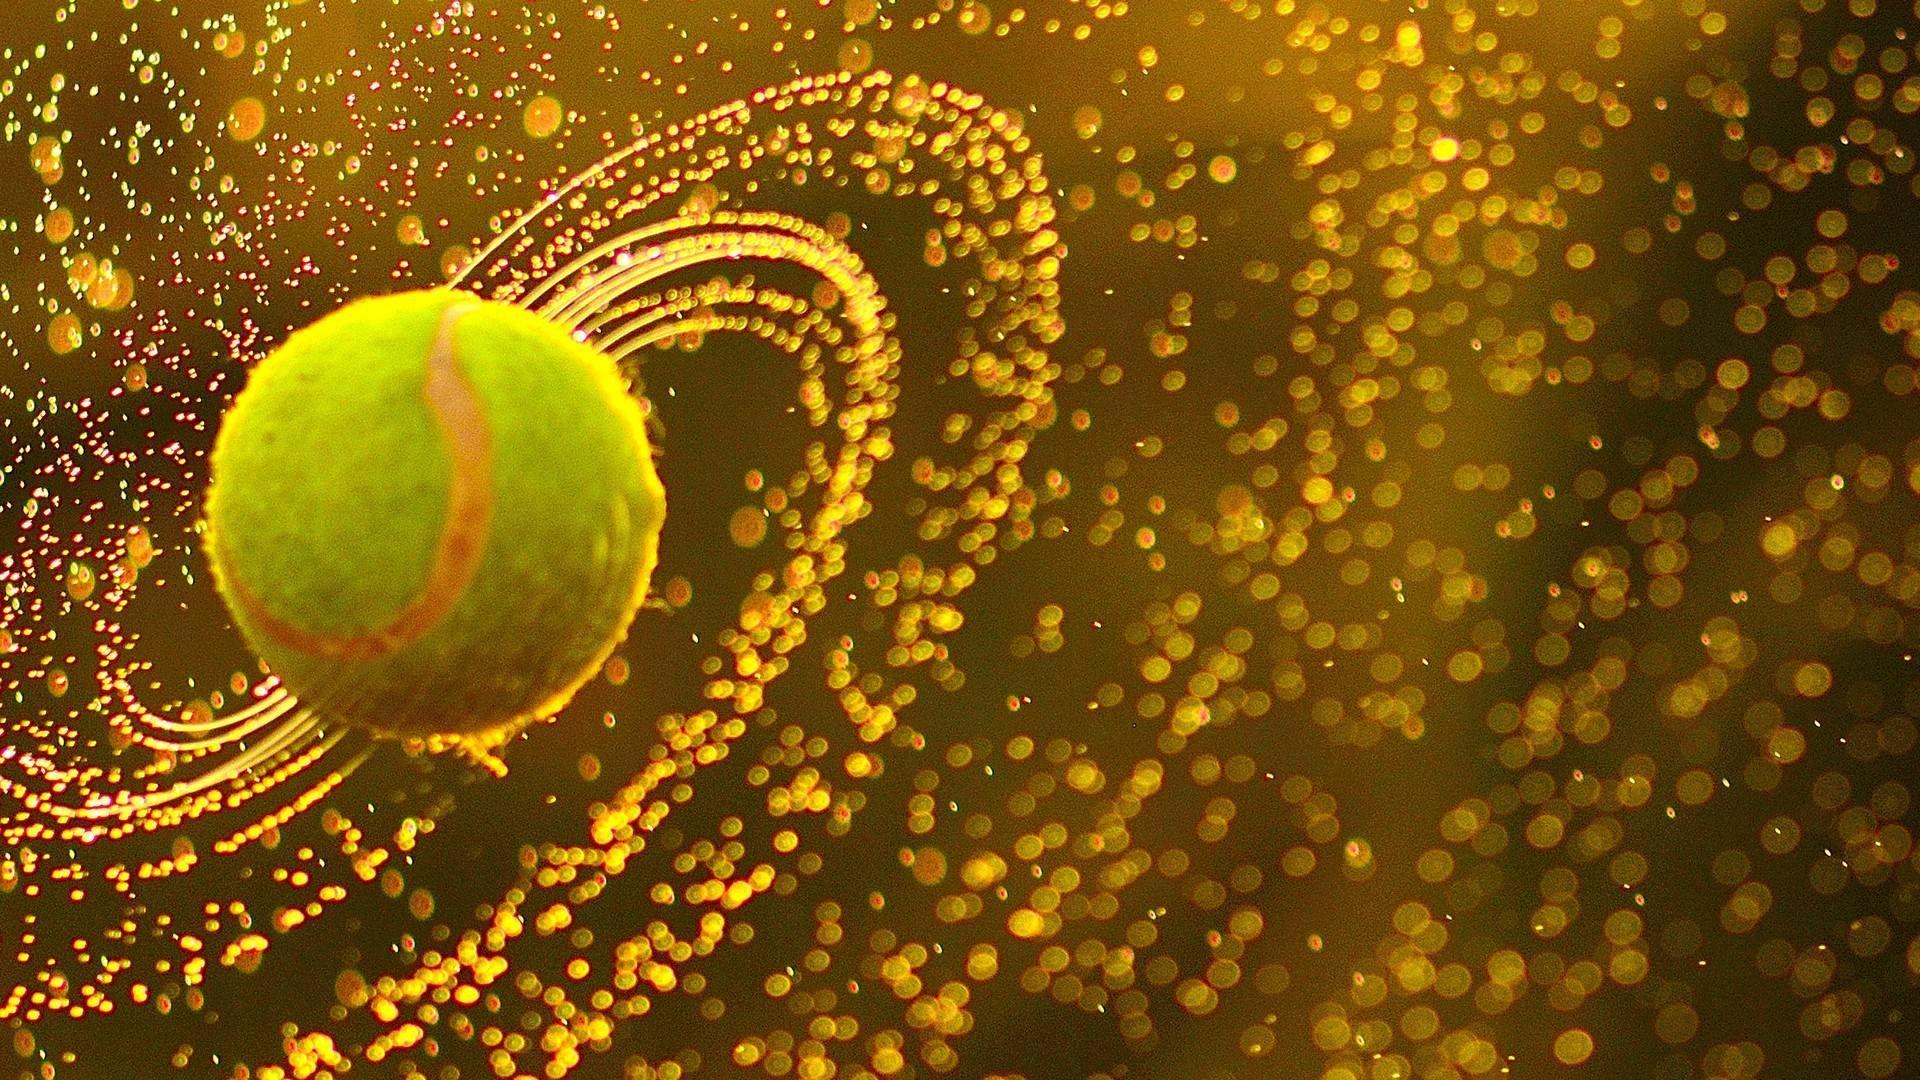 Pin By Todd Parks On Sports Tennis Wallpaper Tennis Ball Tennis